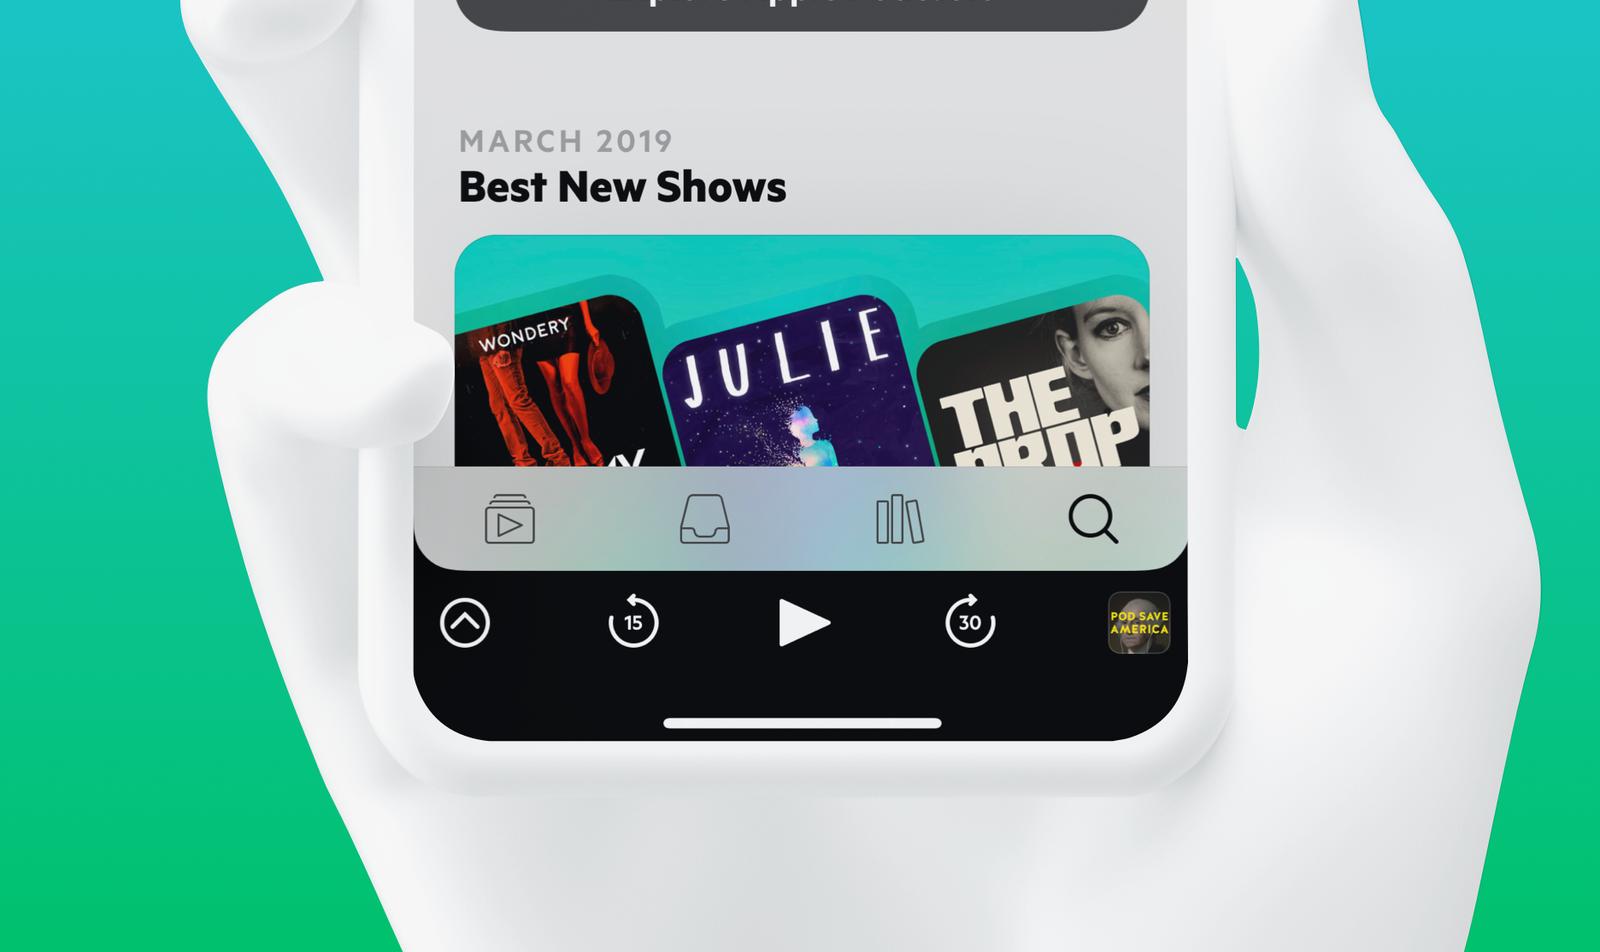 Tiny Logo and Castro app icon on blue background